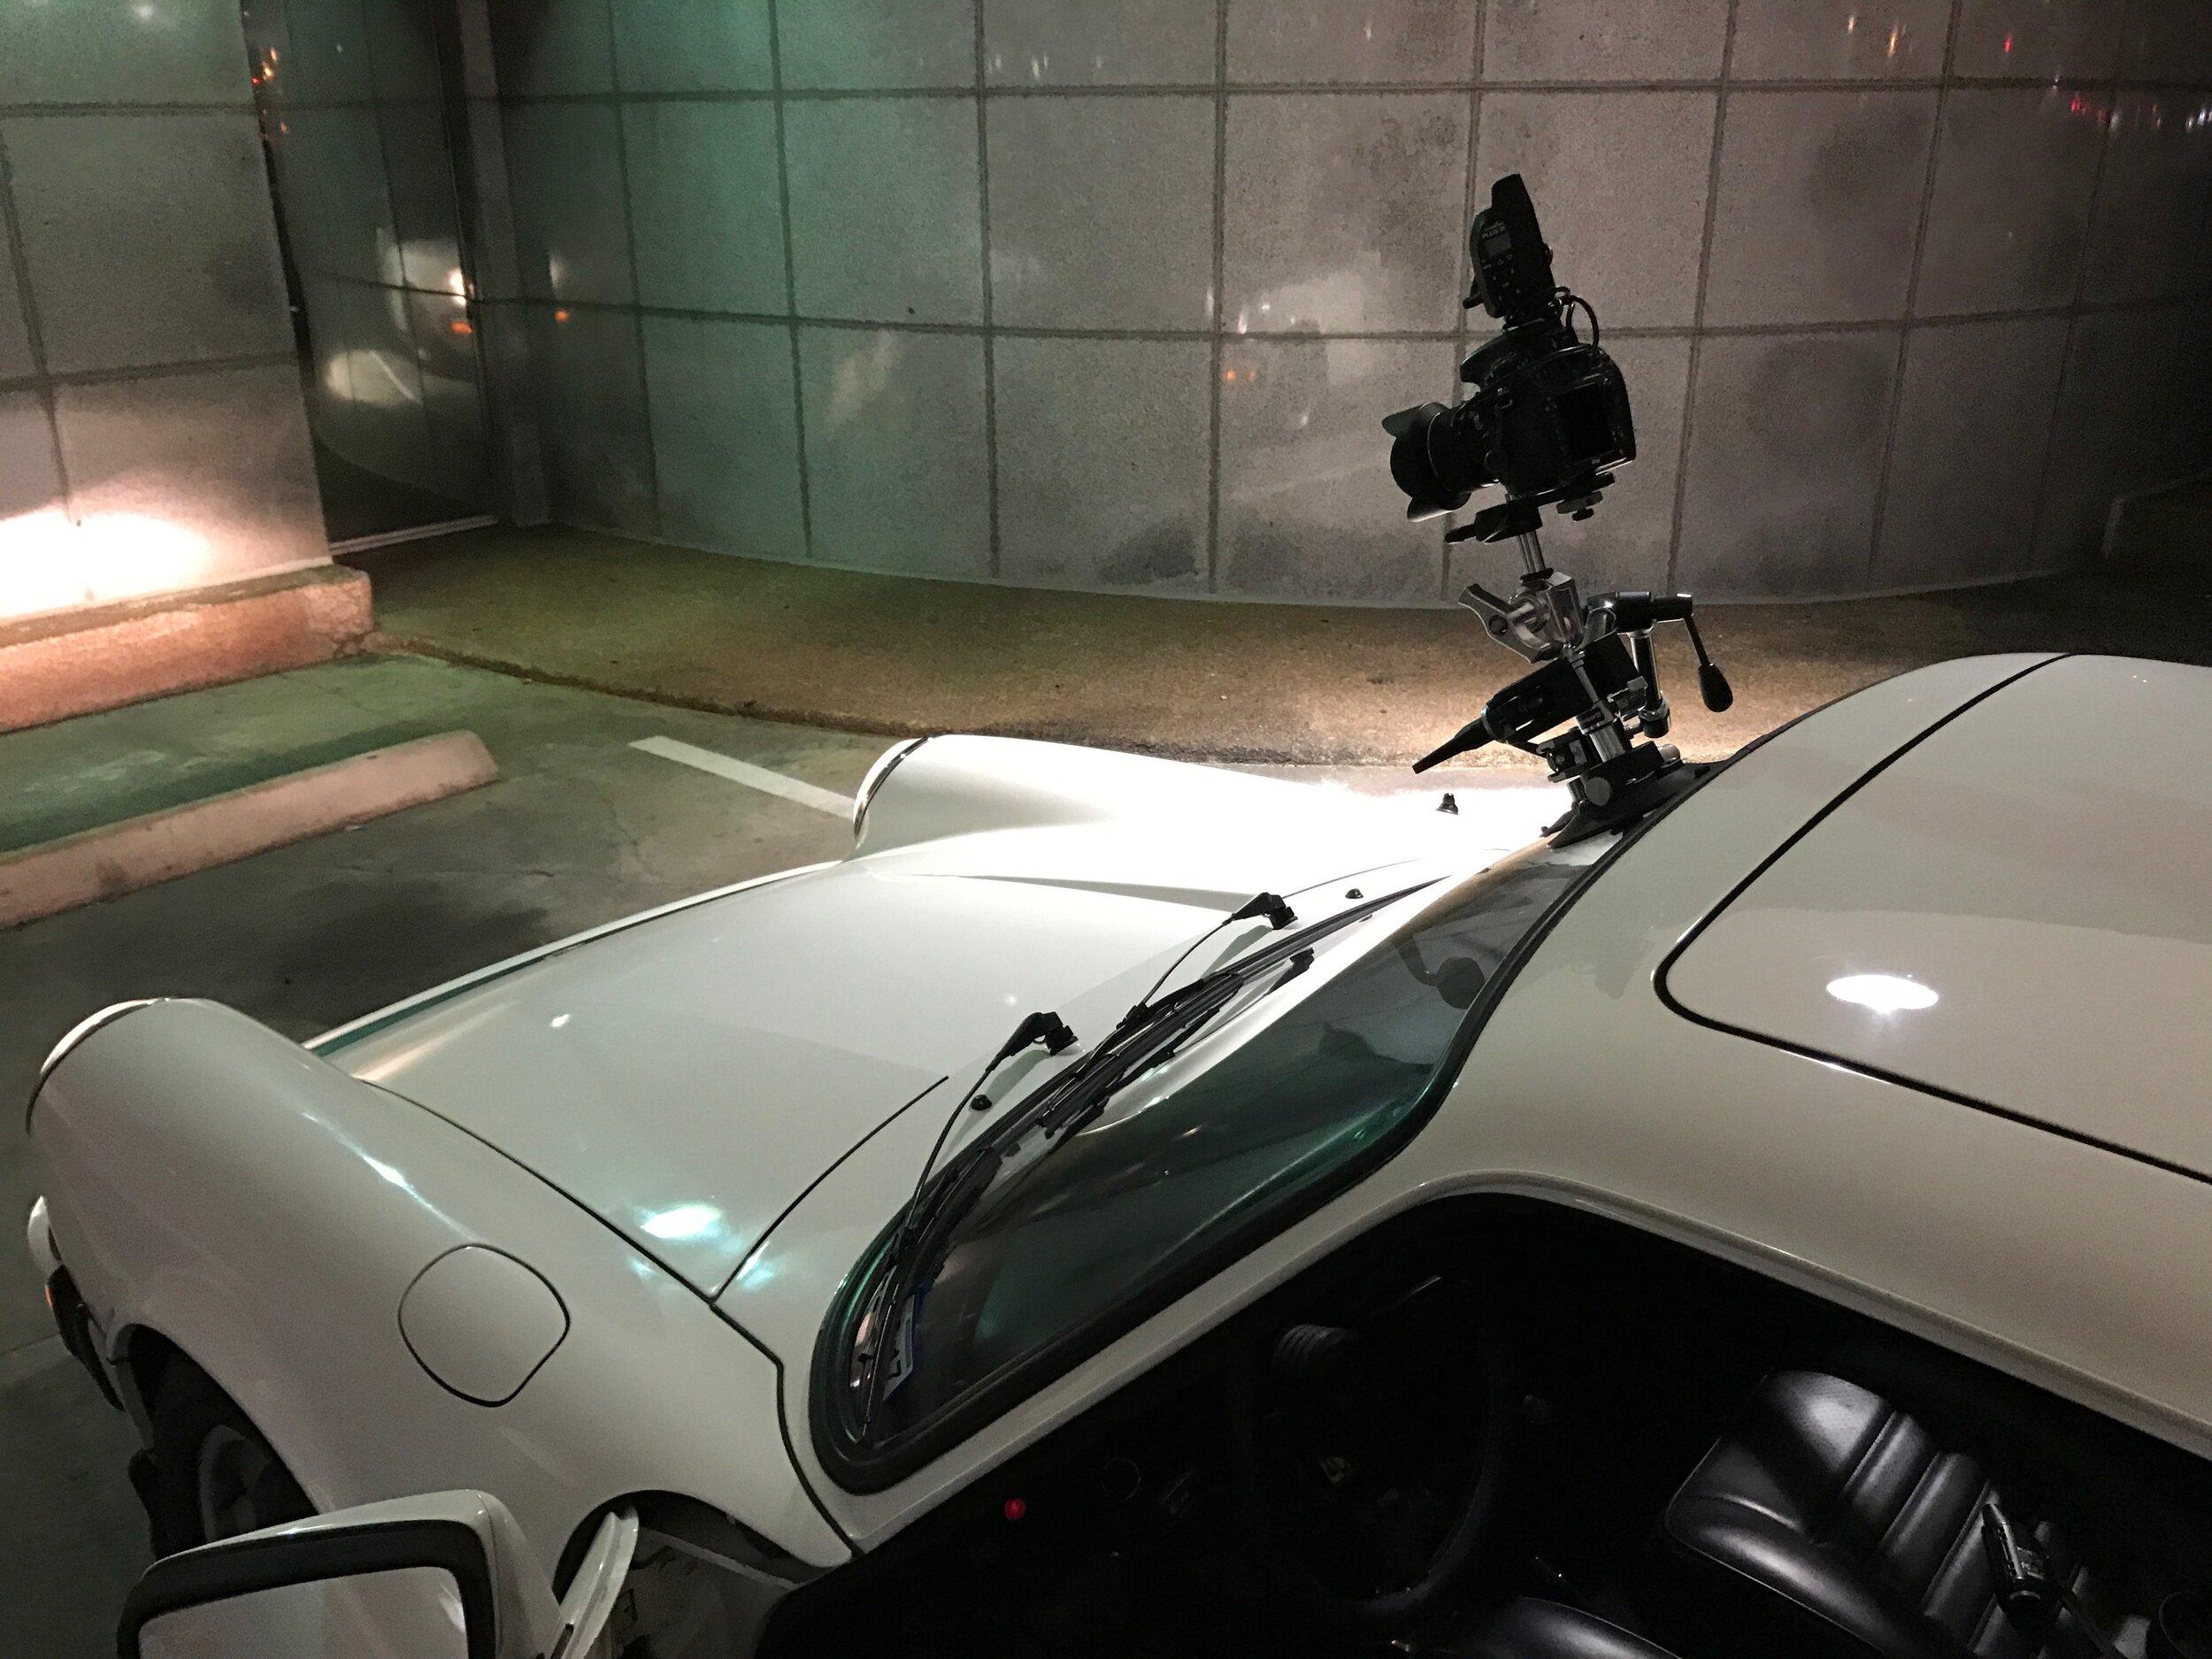 Setup for the driving shot